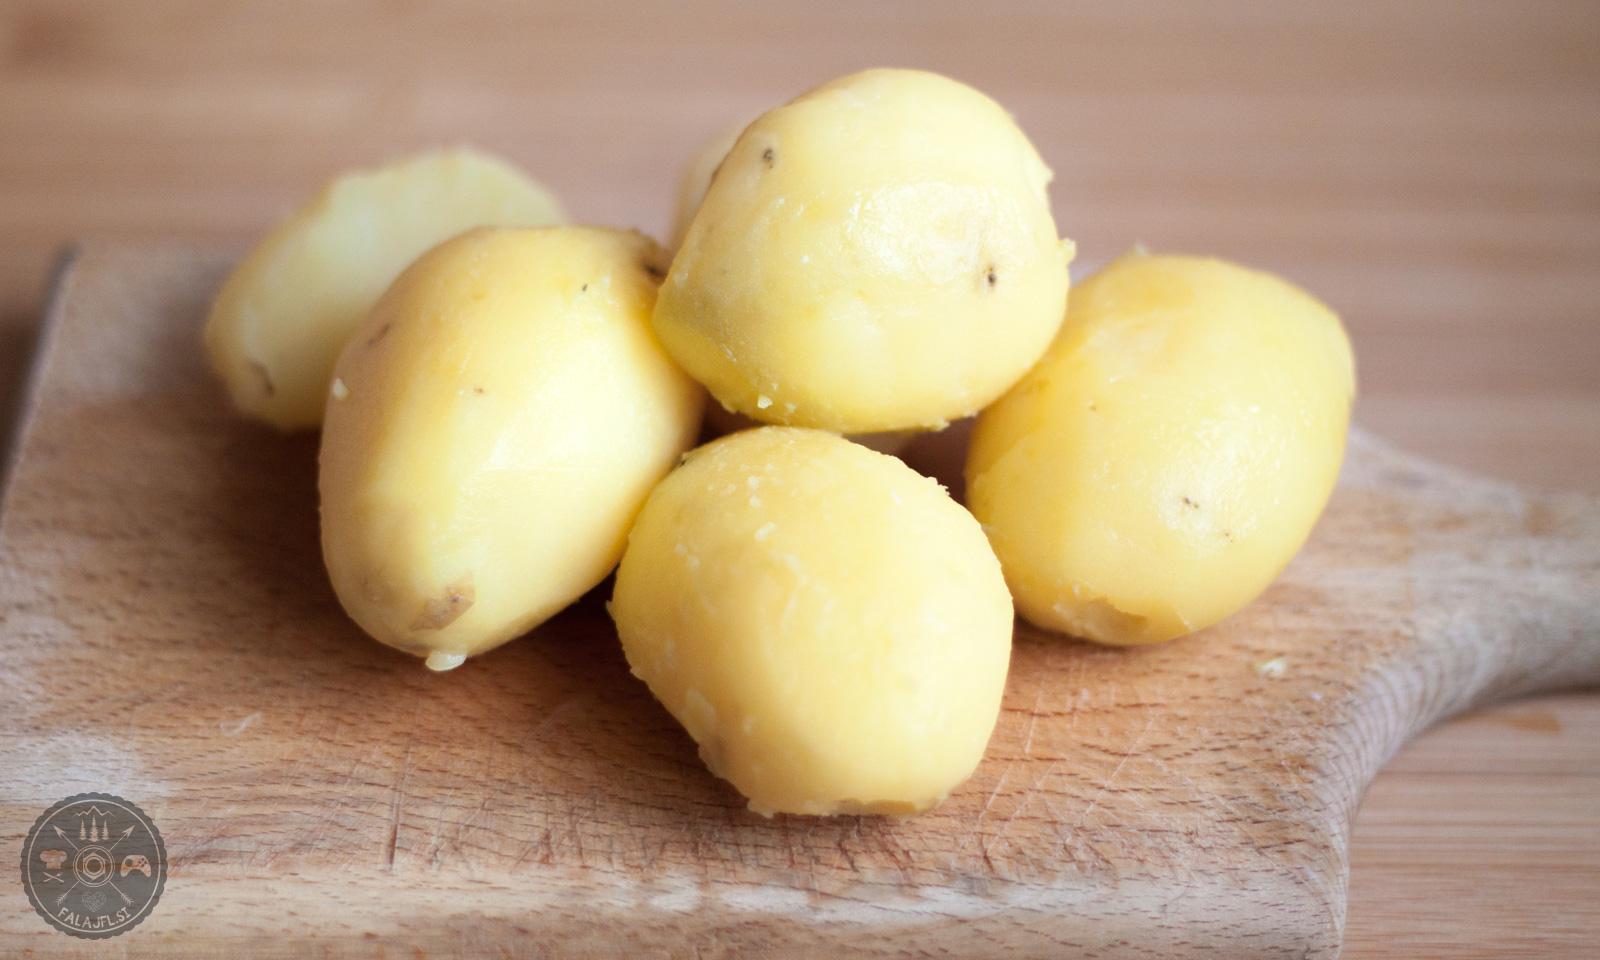 Olupljen kuhan krompir